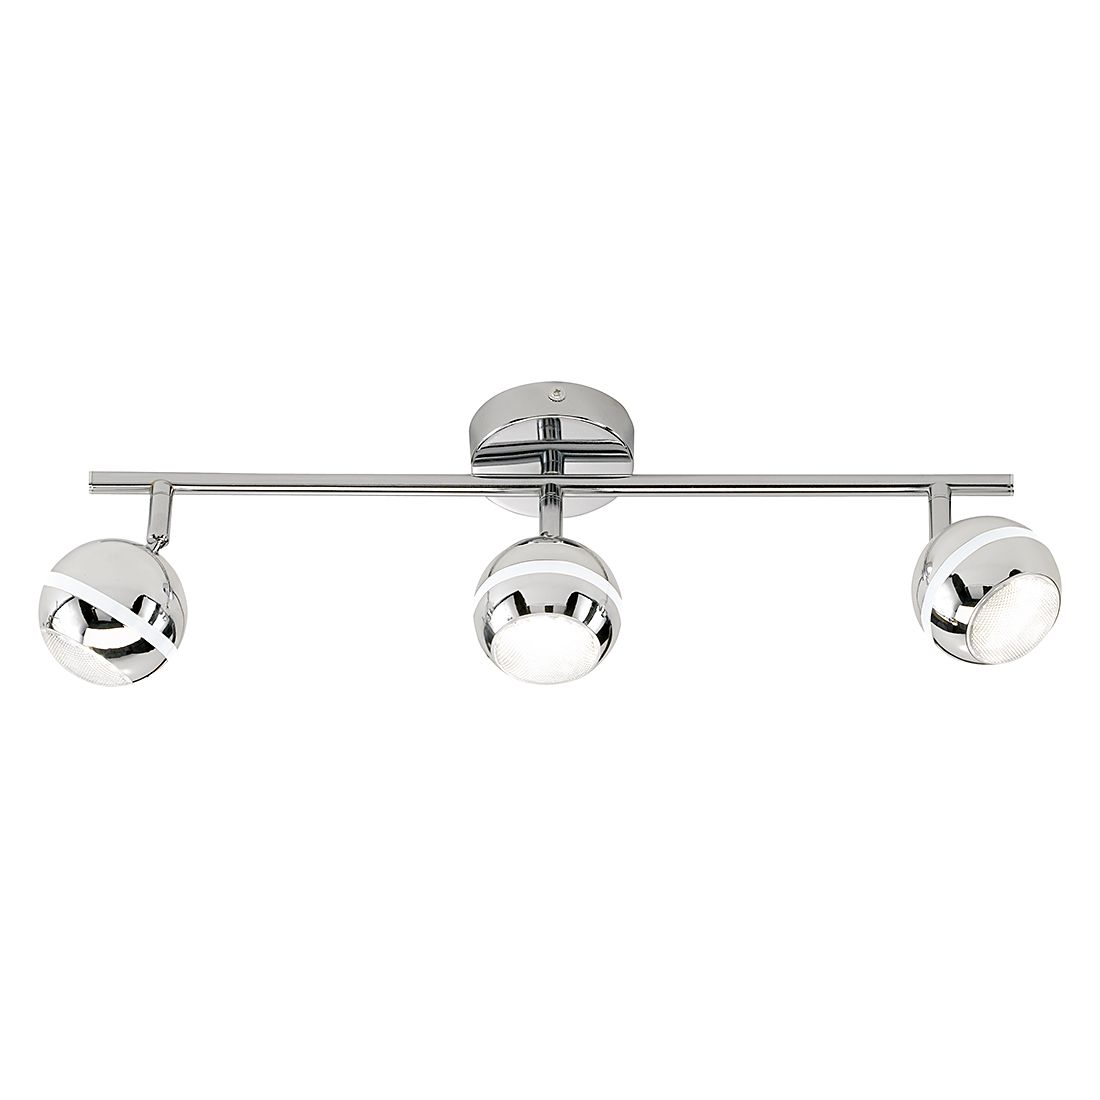 LED-Balken – Chrom – 3×4,2 W, Trio jetzt kaufen